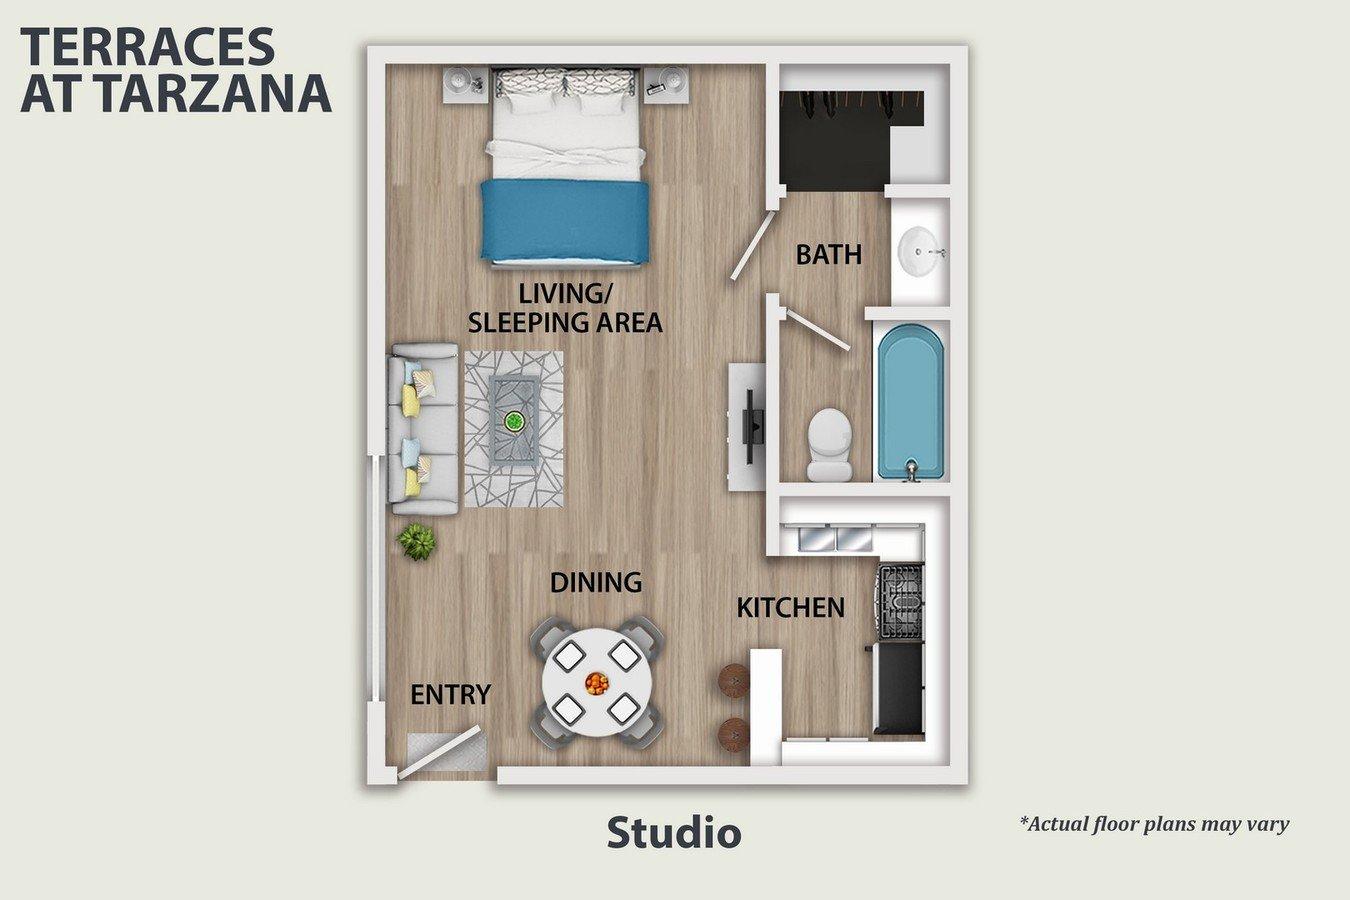 Studio 1 Bathroom Apartment for rent at Terraces at Tarzana in Tarzana, CA